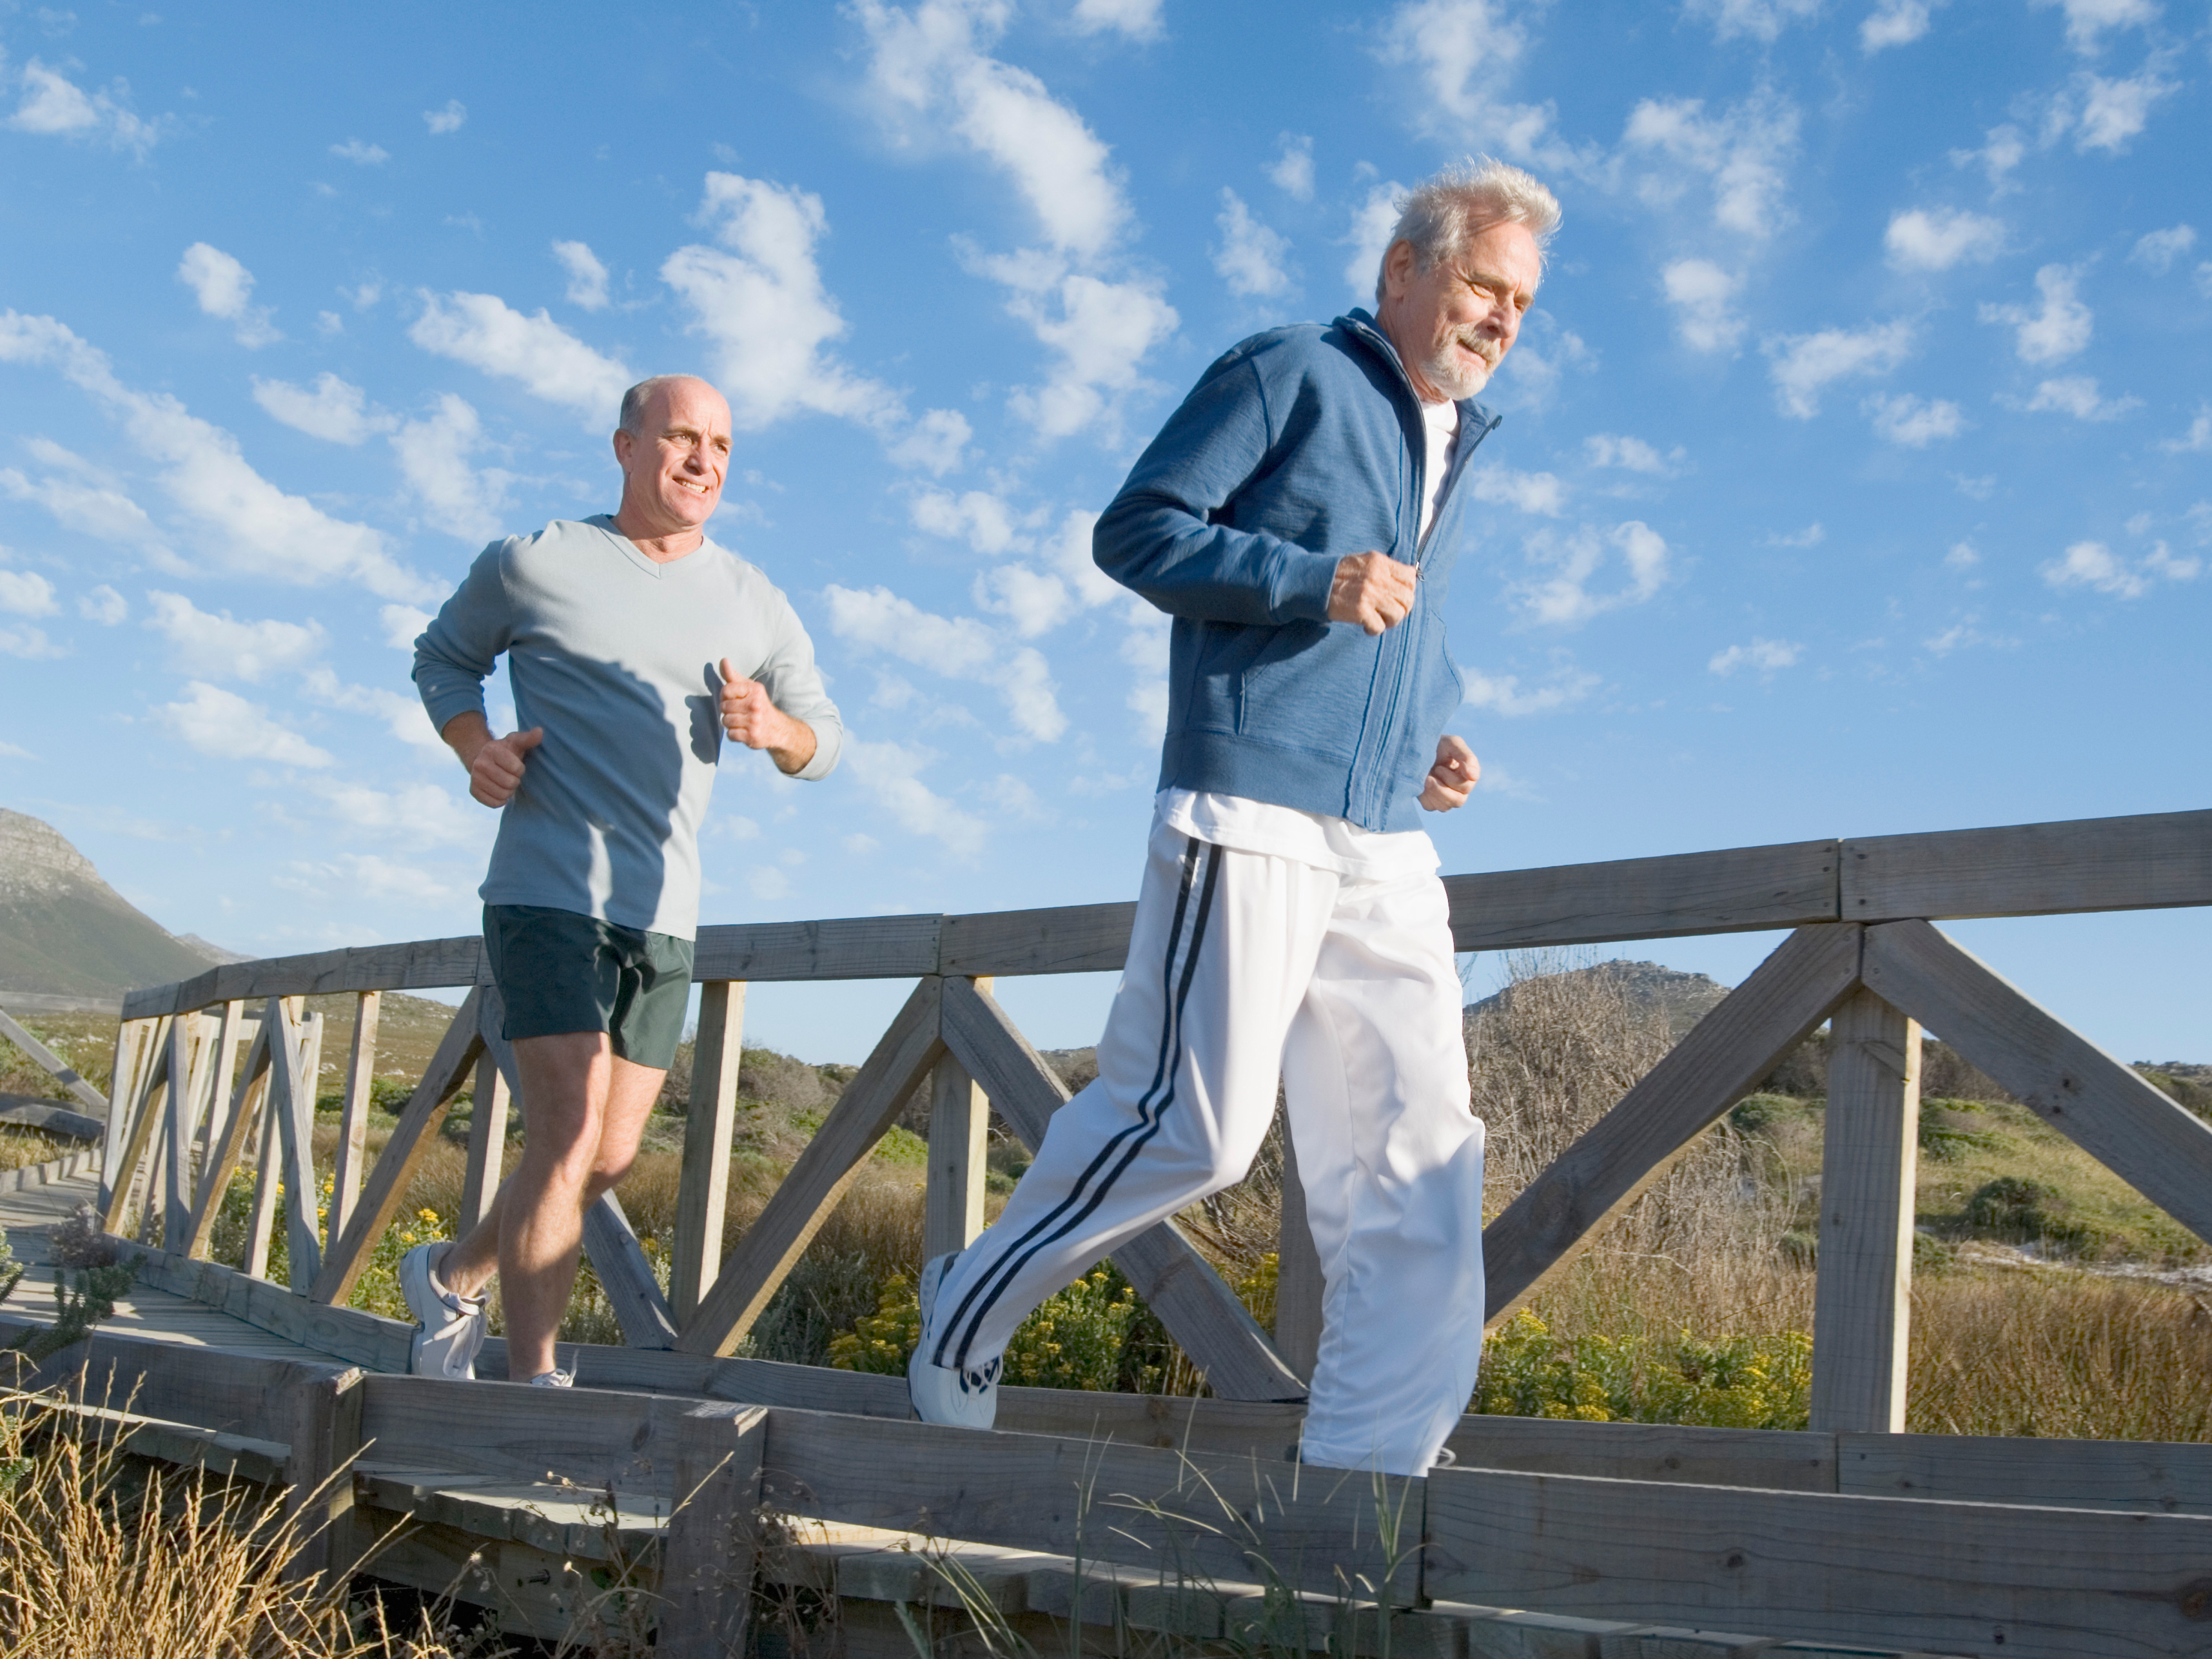 Best exercises for enlarged prostate